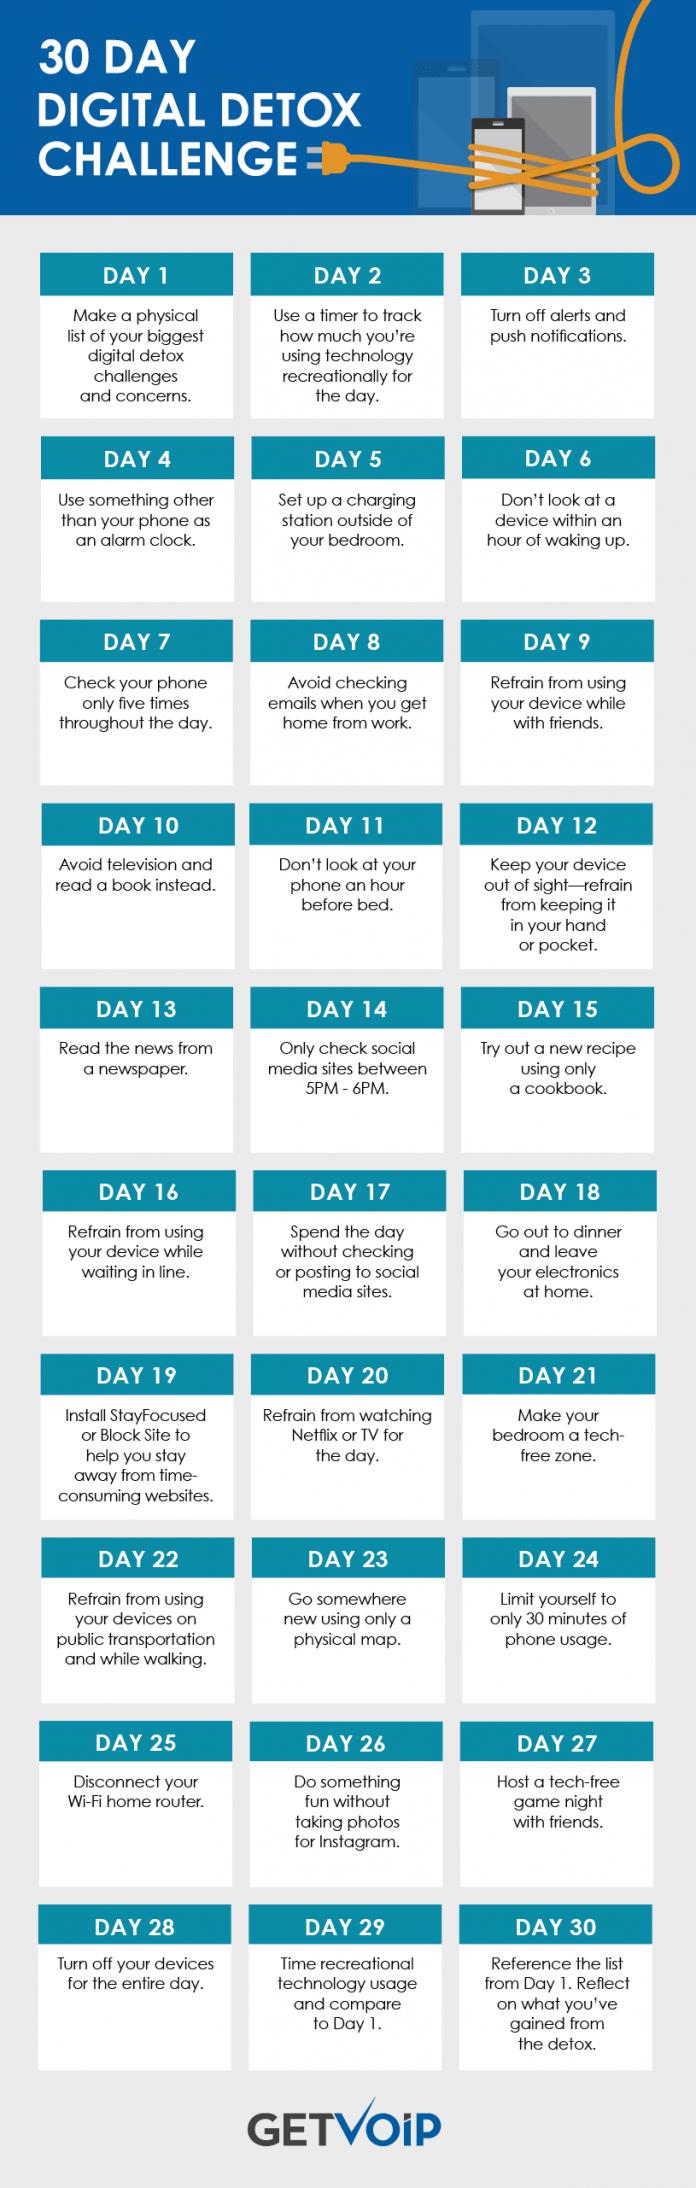 30 Day Digital Detox Challenge 2